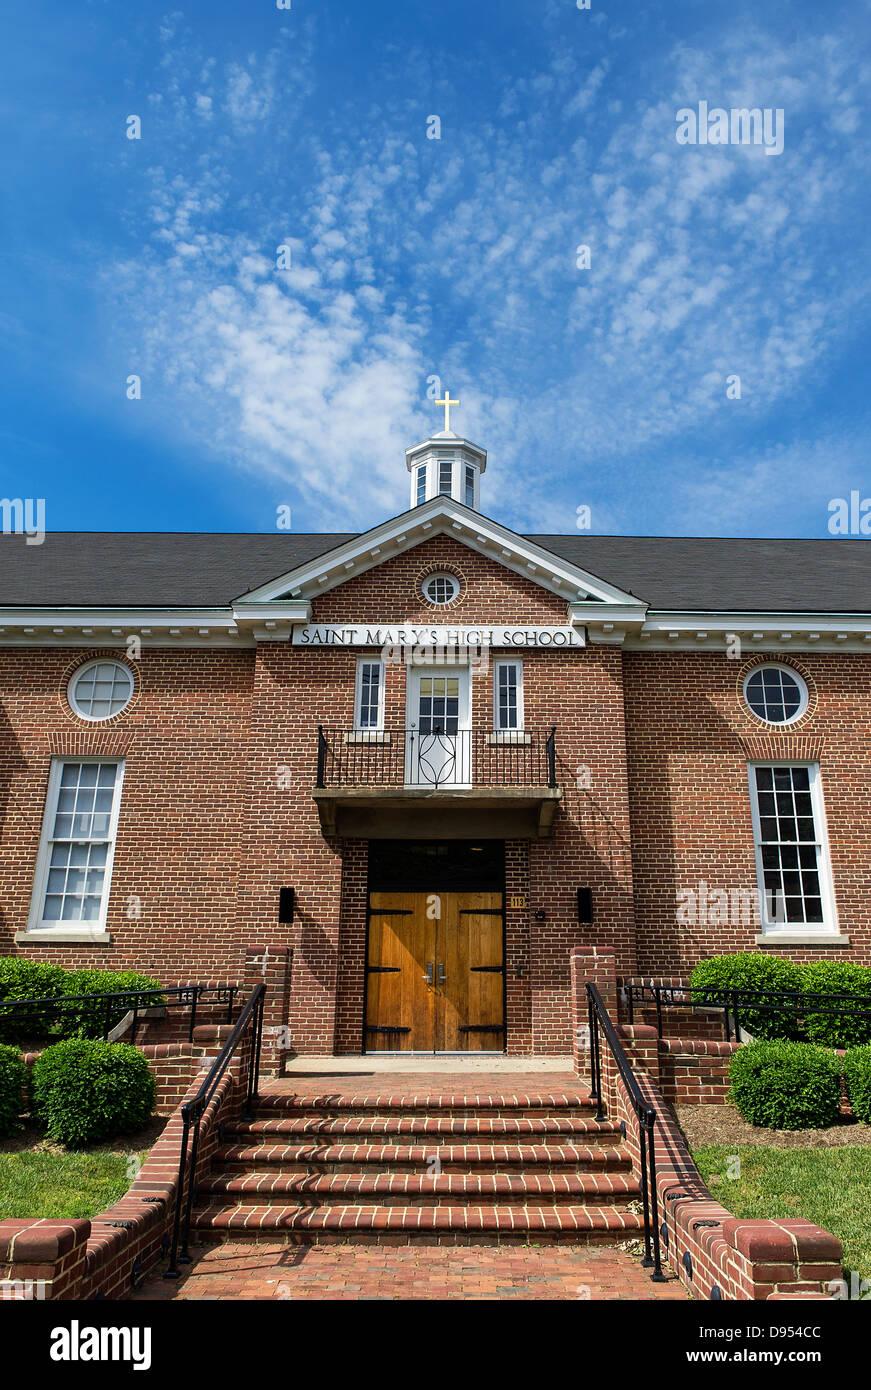 Saint Mary's High School, en Annapolis, Maryland, EE.UU. Imagen De Stock